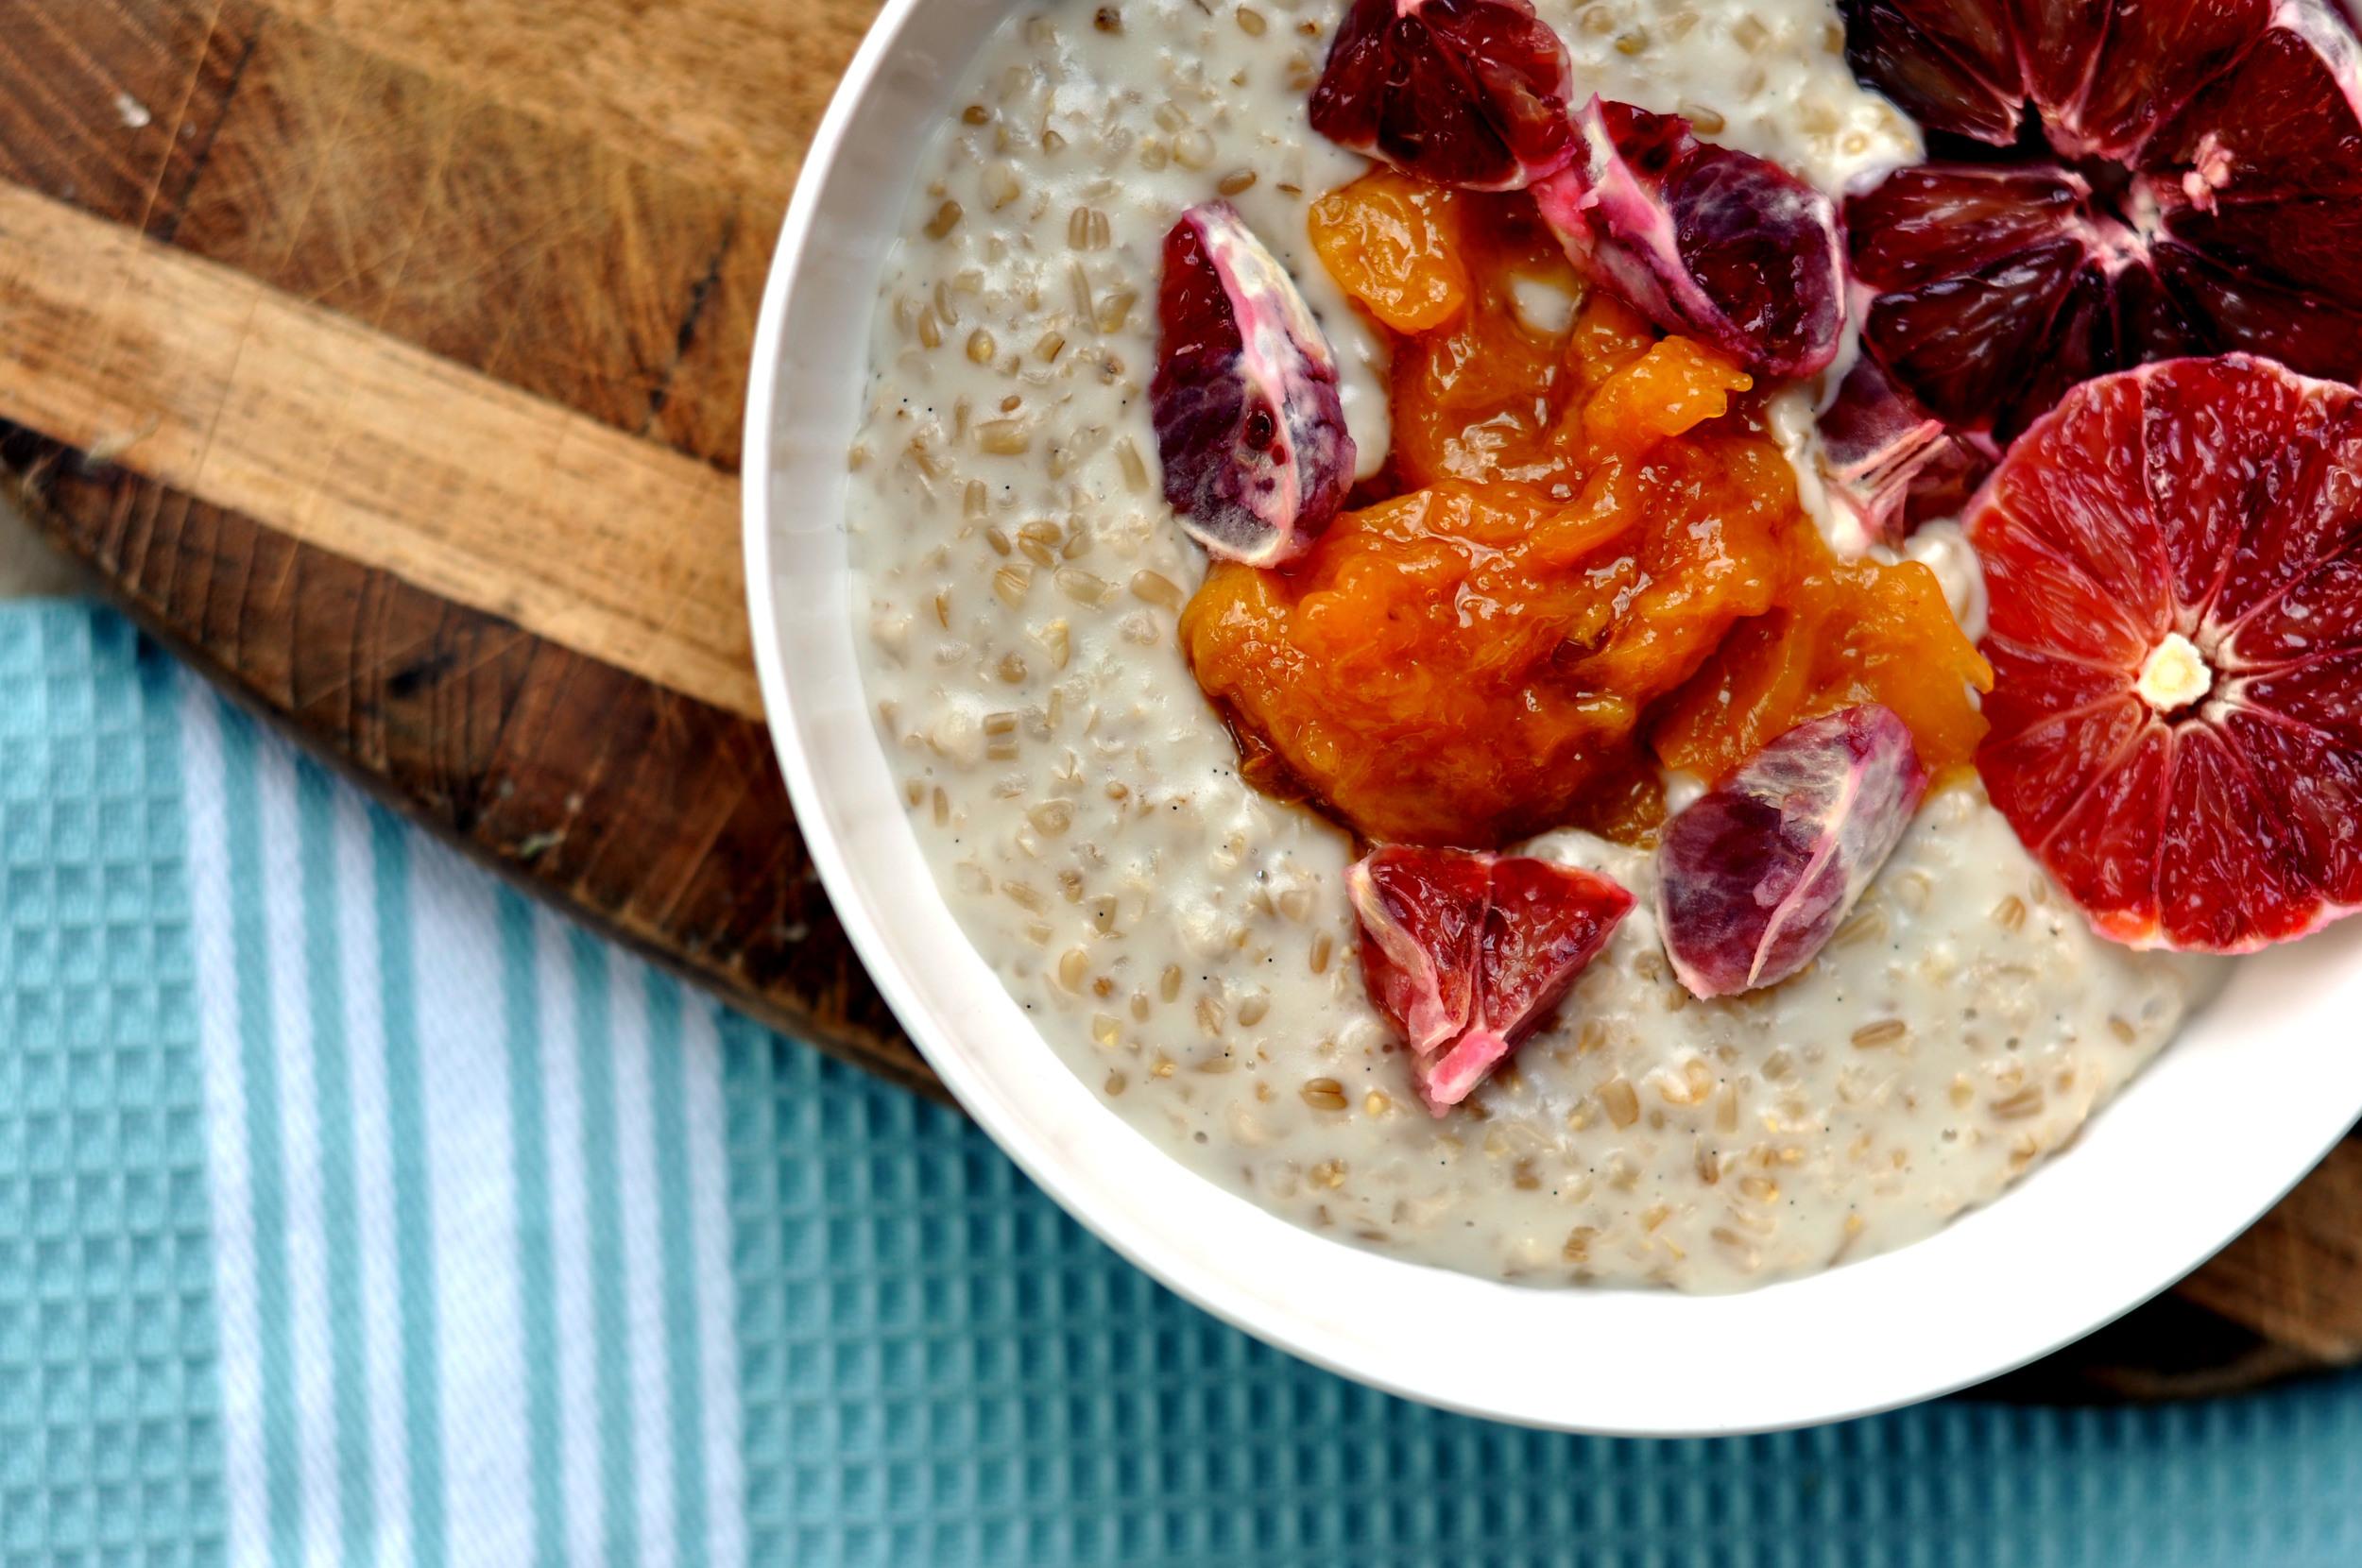 Almond Milk Oatmeal with Vanilla & a Peach Compote | Shiny Happy Bright